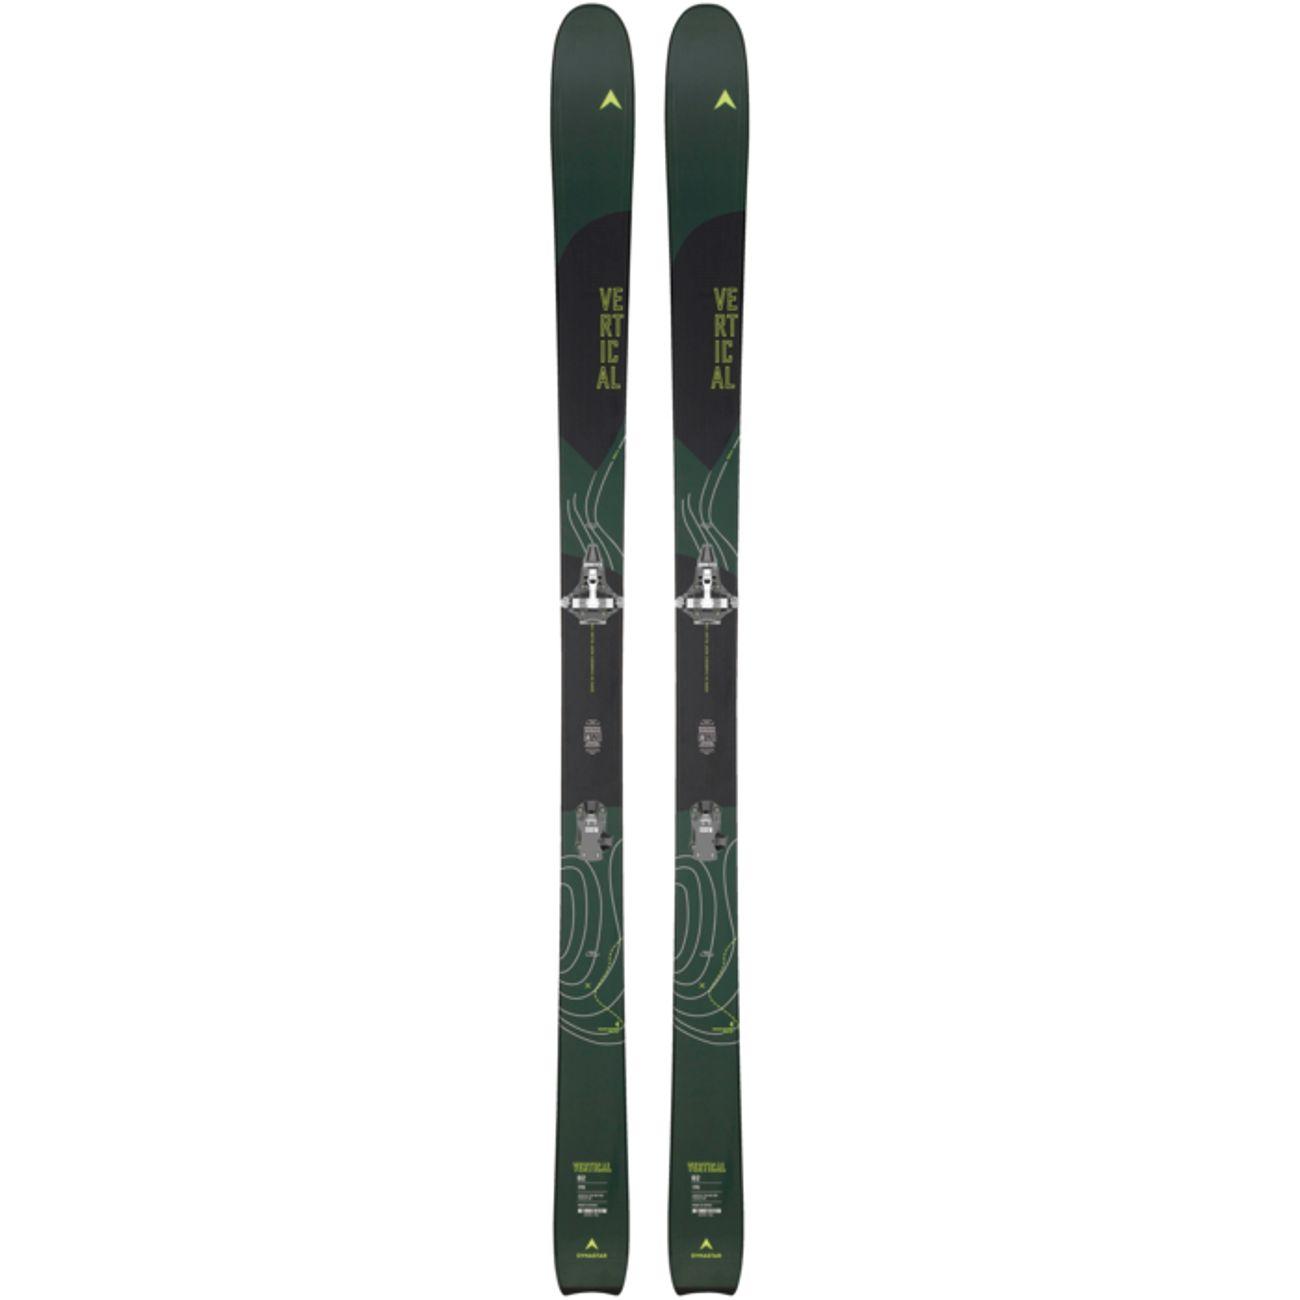 SKIS Ski mixte DYNASTAR VERTICAL  (OPEN) ST 10